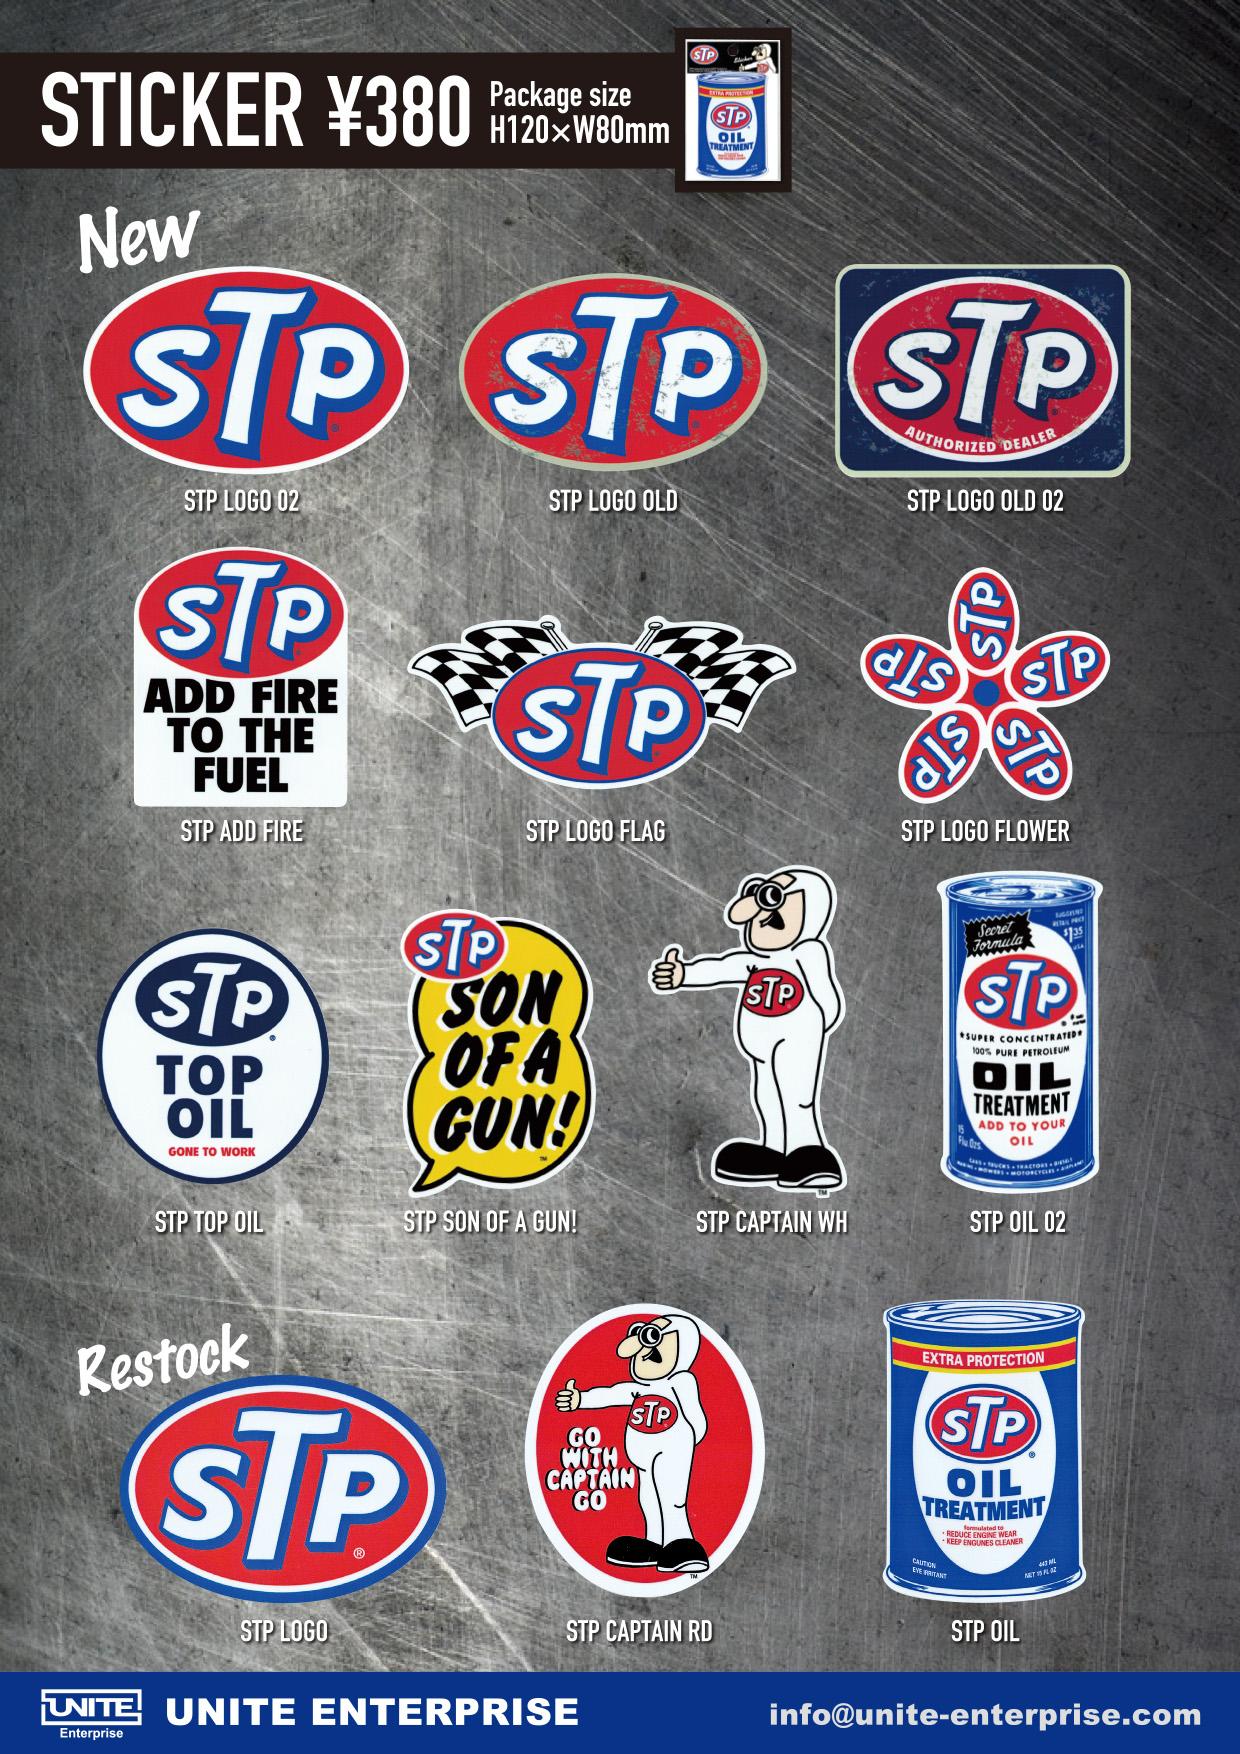 20190421_STP sticker